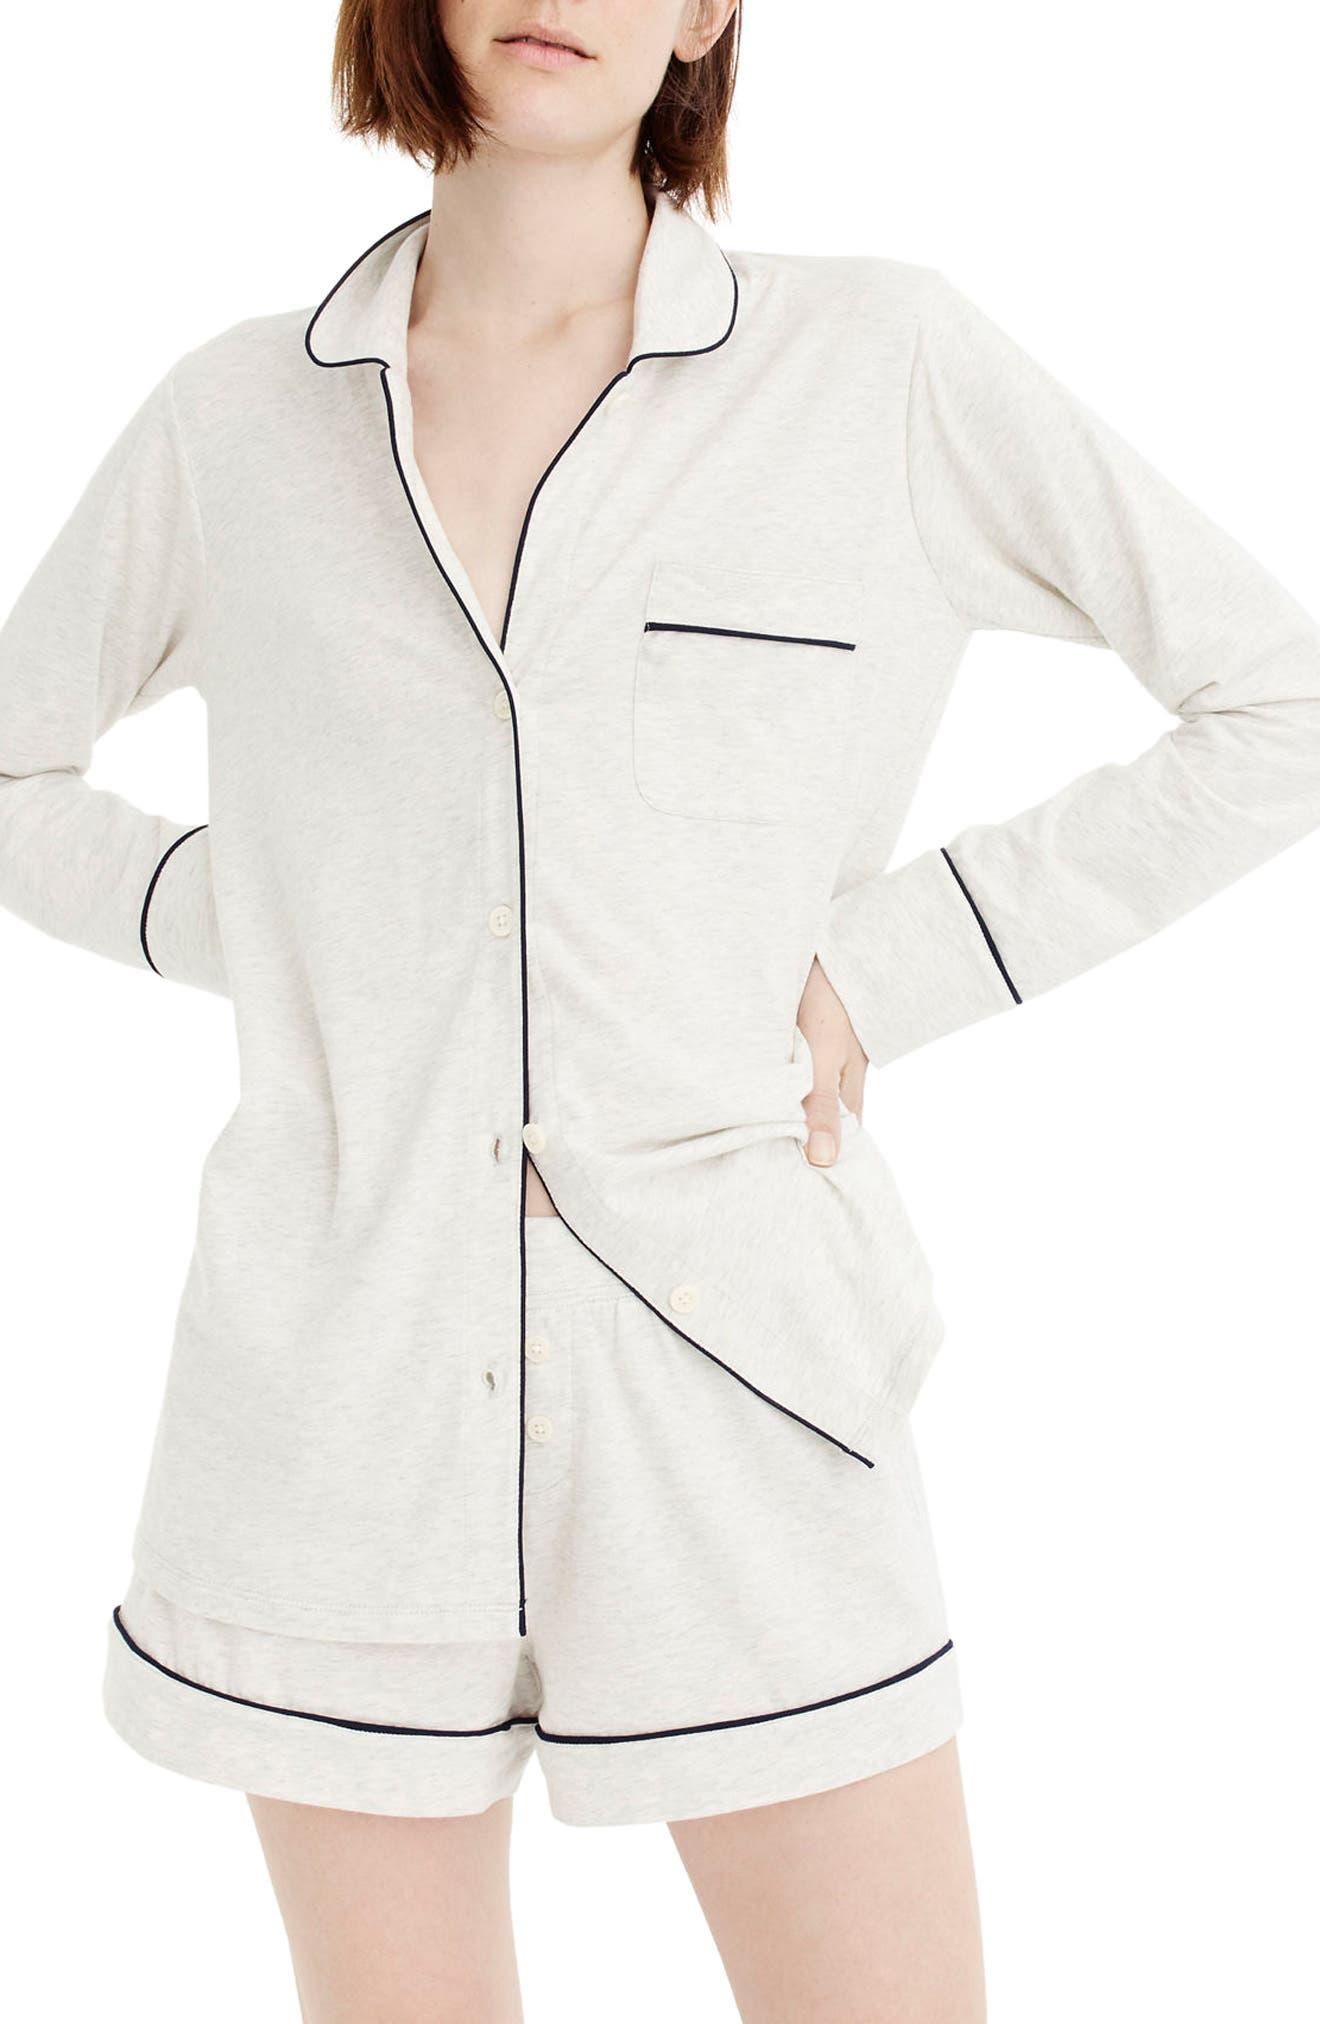 J.CREW Dreamy Short Cotton Pajamas, Main, color, HEATHER CLOUD